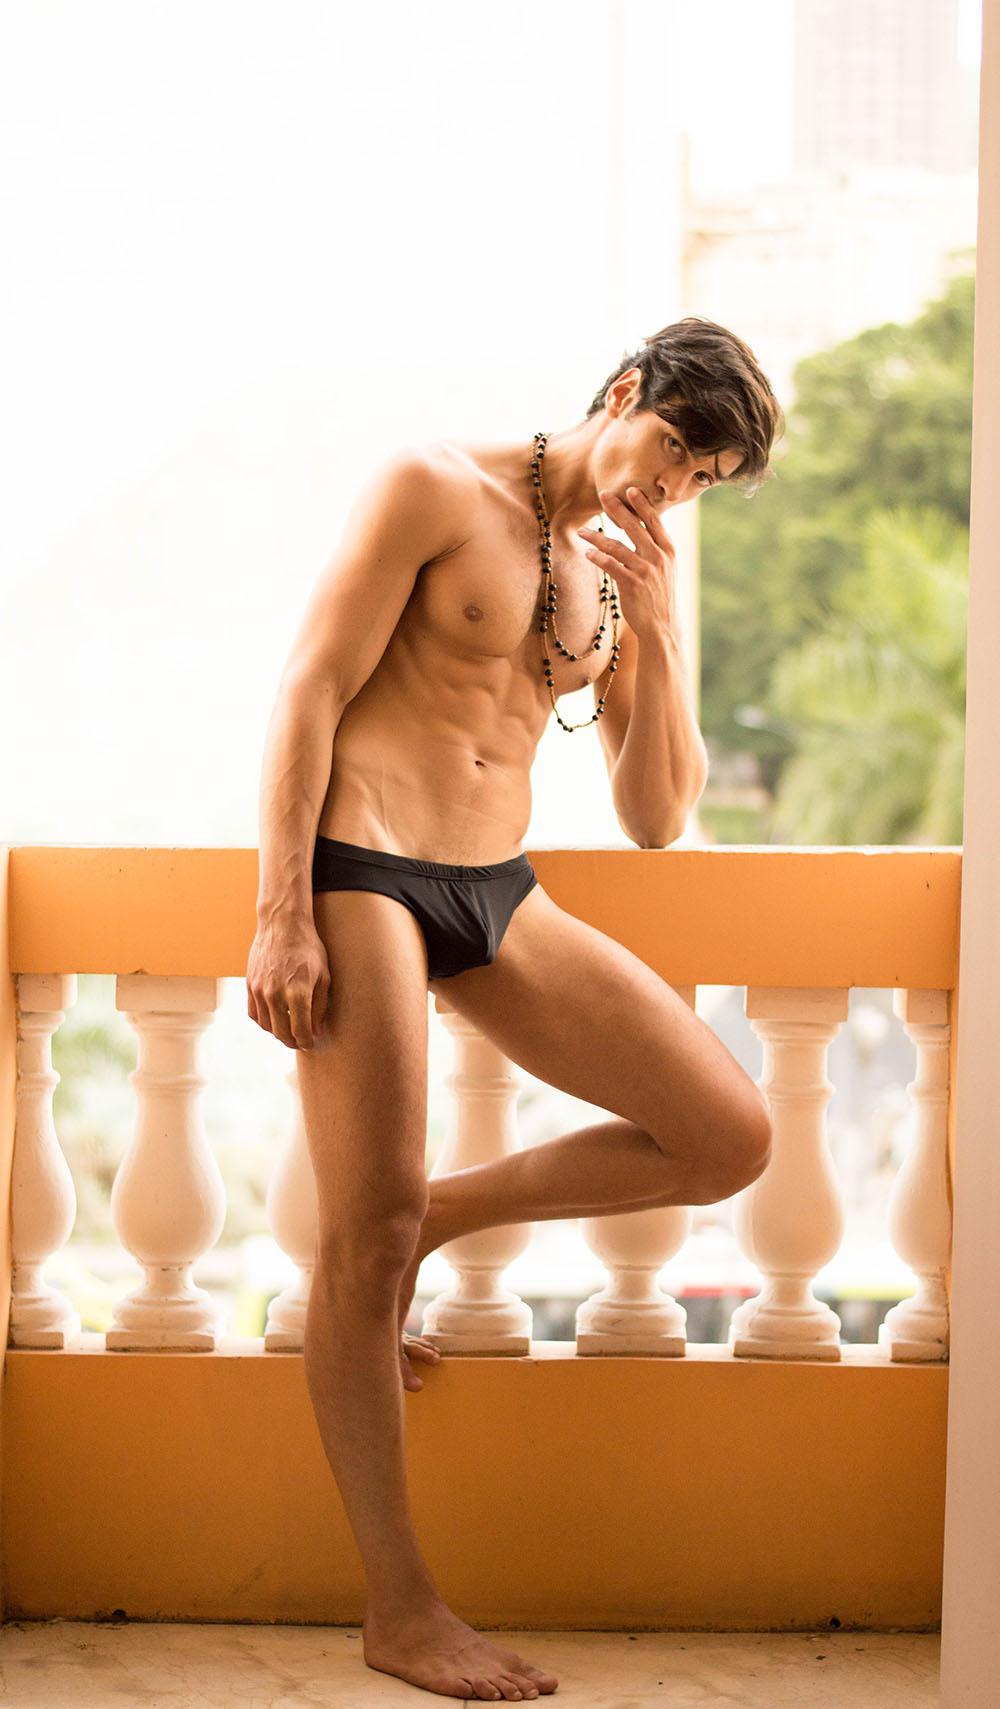 Igor Augusto by Rodrigo Nuñes